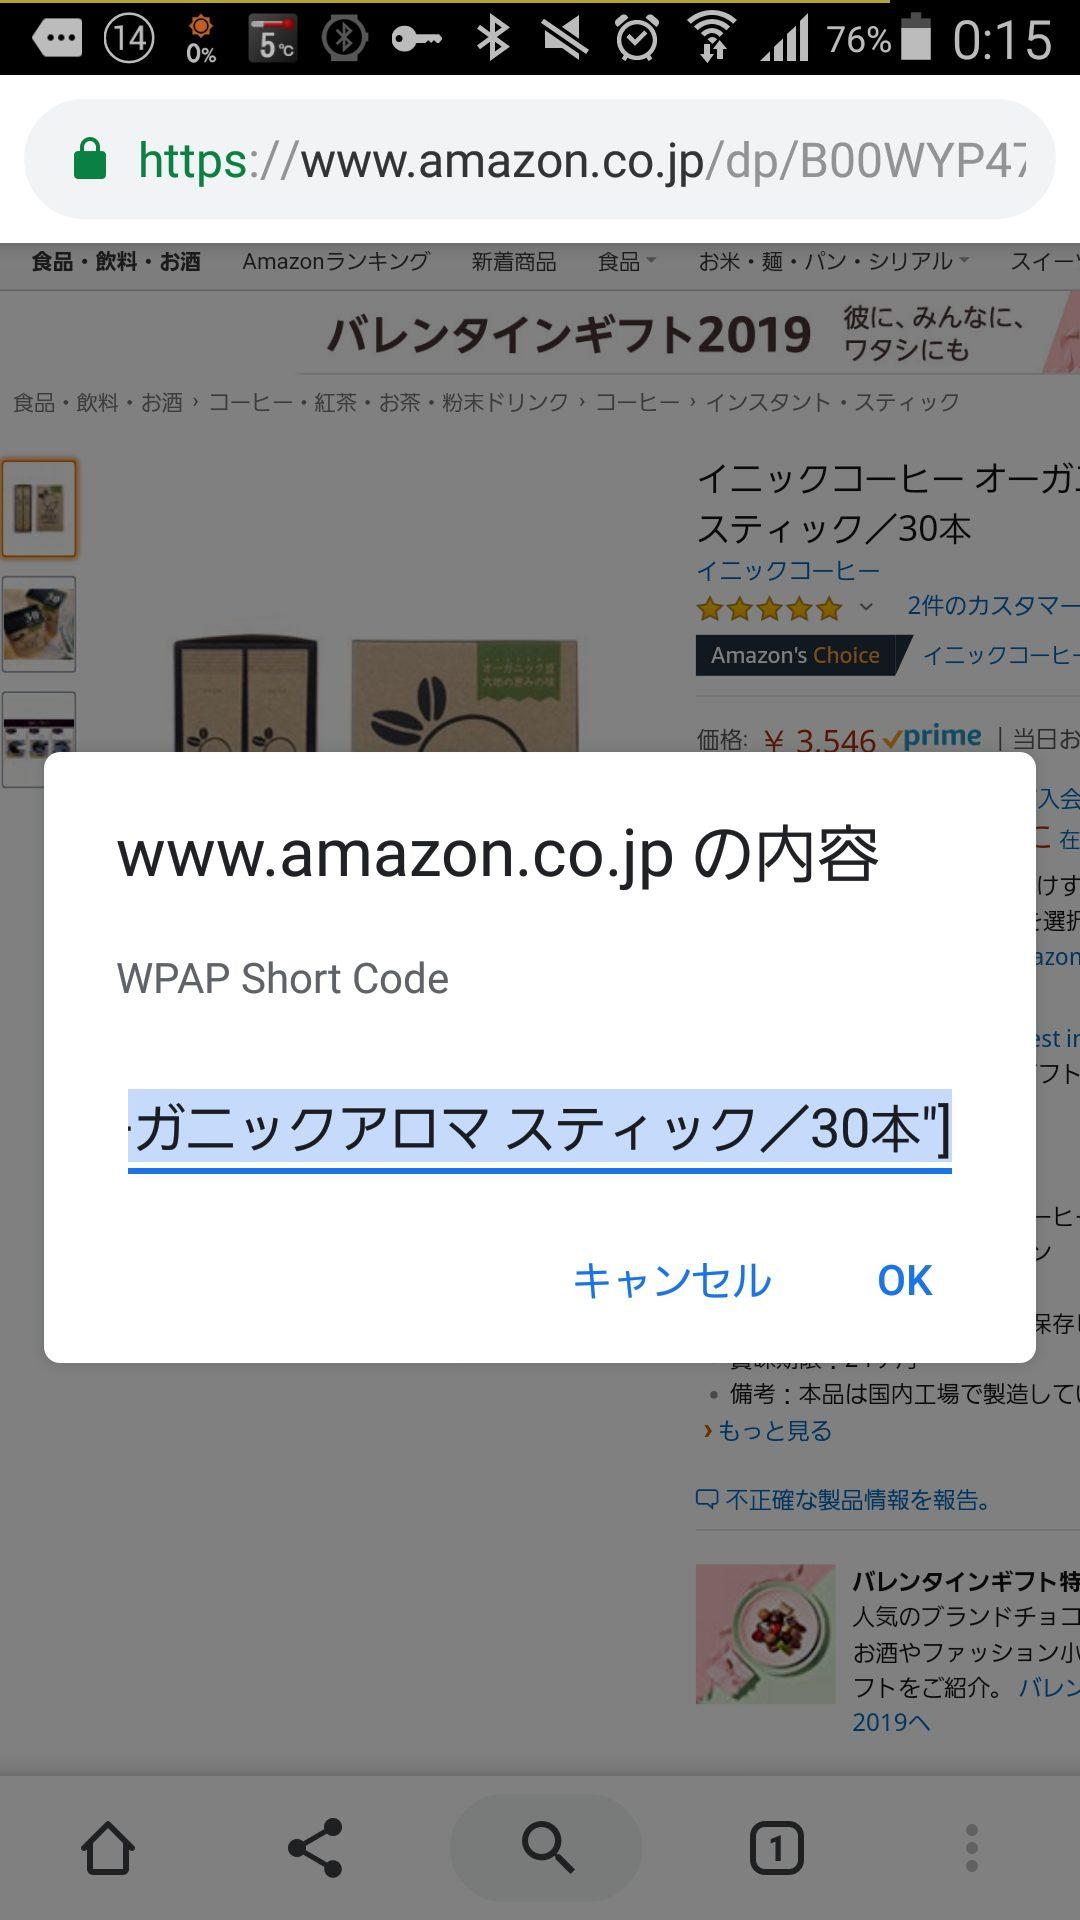 screenshot_2019-01-14-00-15-42-1932855068.png